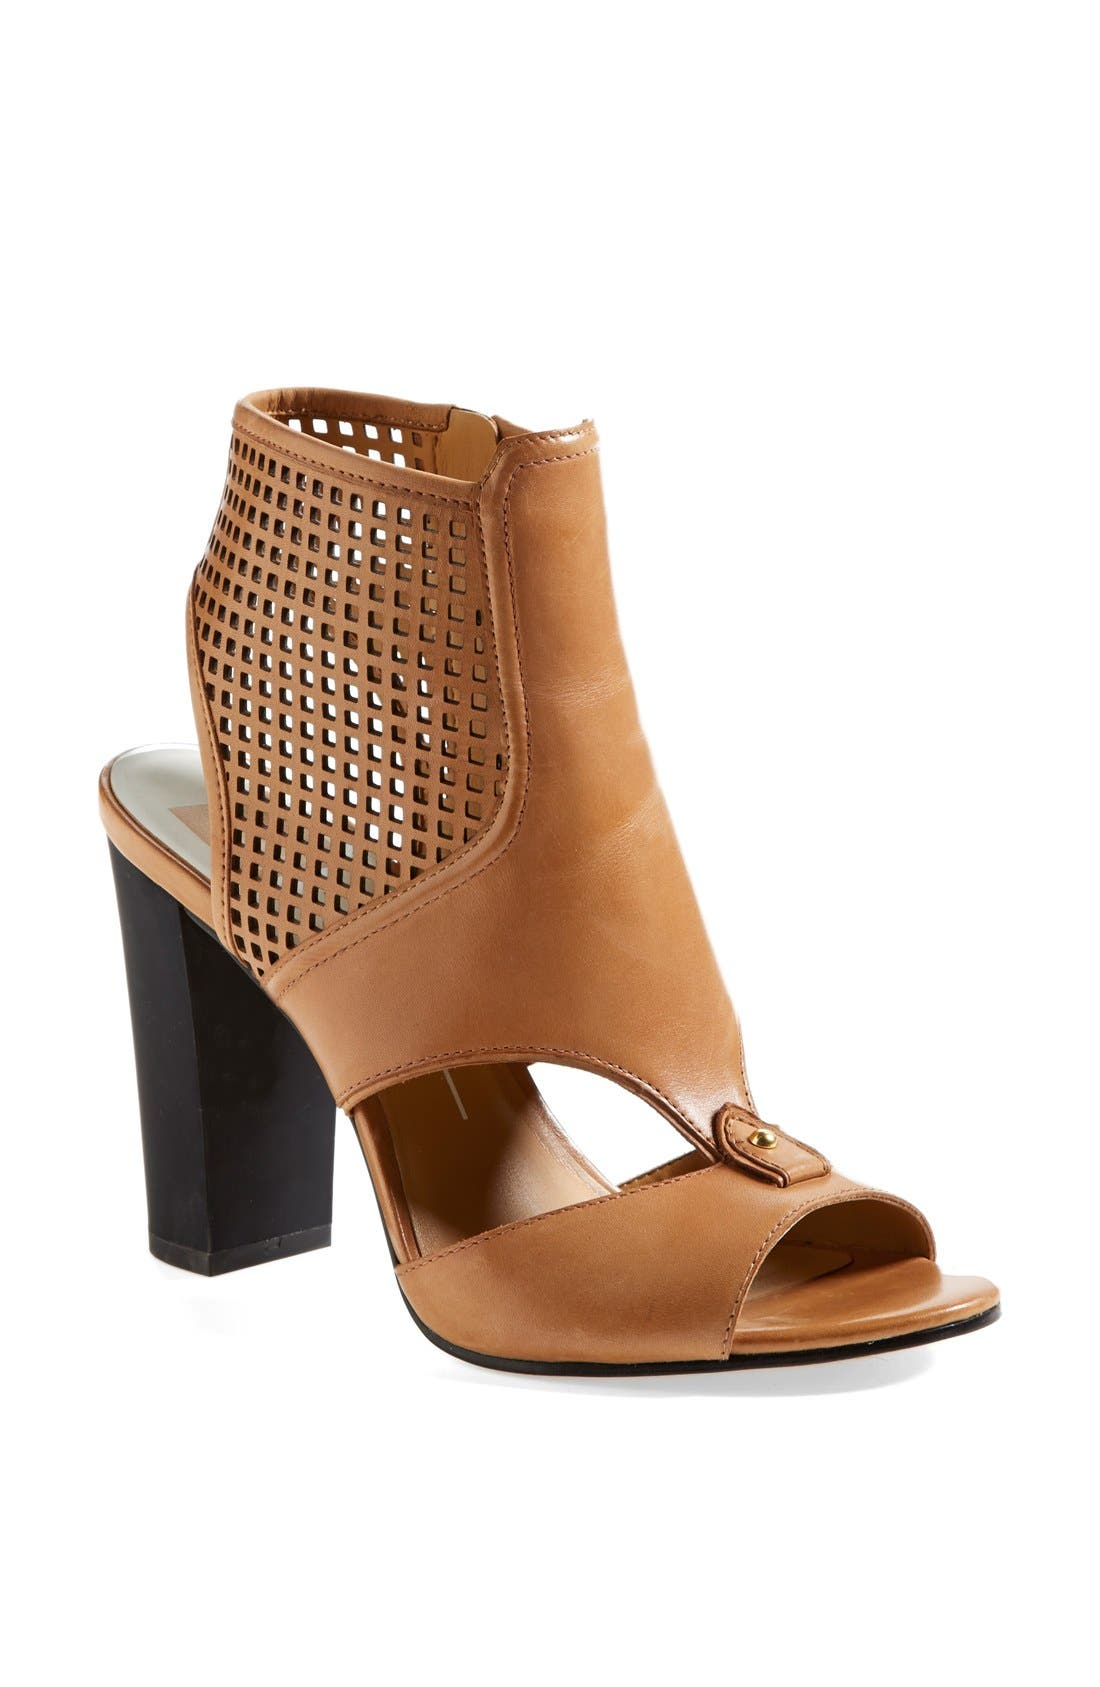 Alternate Image 1 Selected - Dolce Vita 'Nona' Sandal